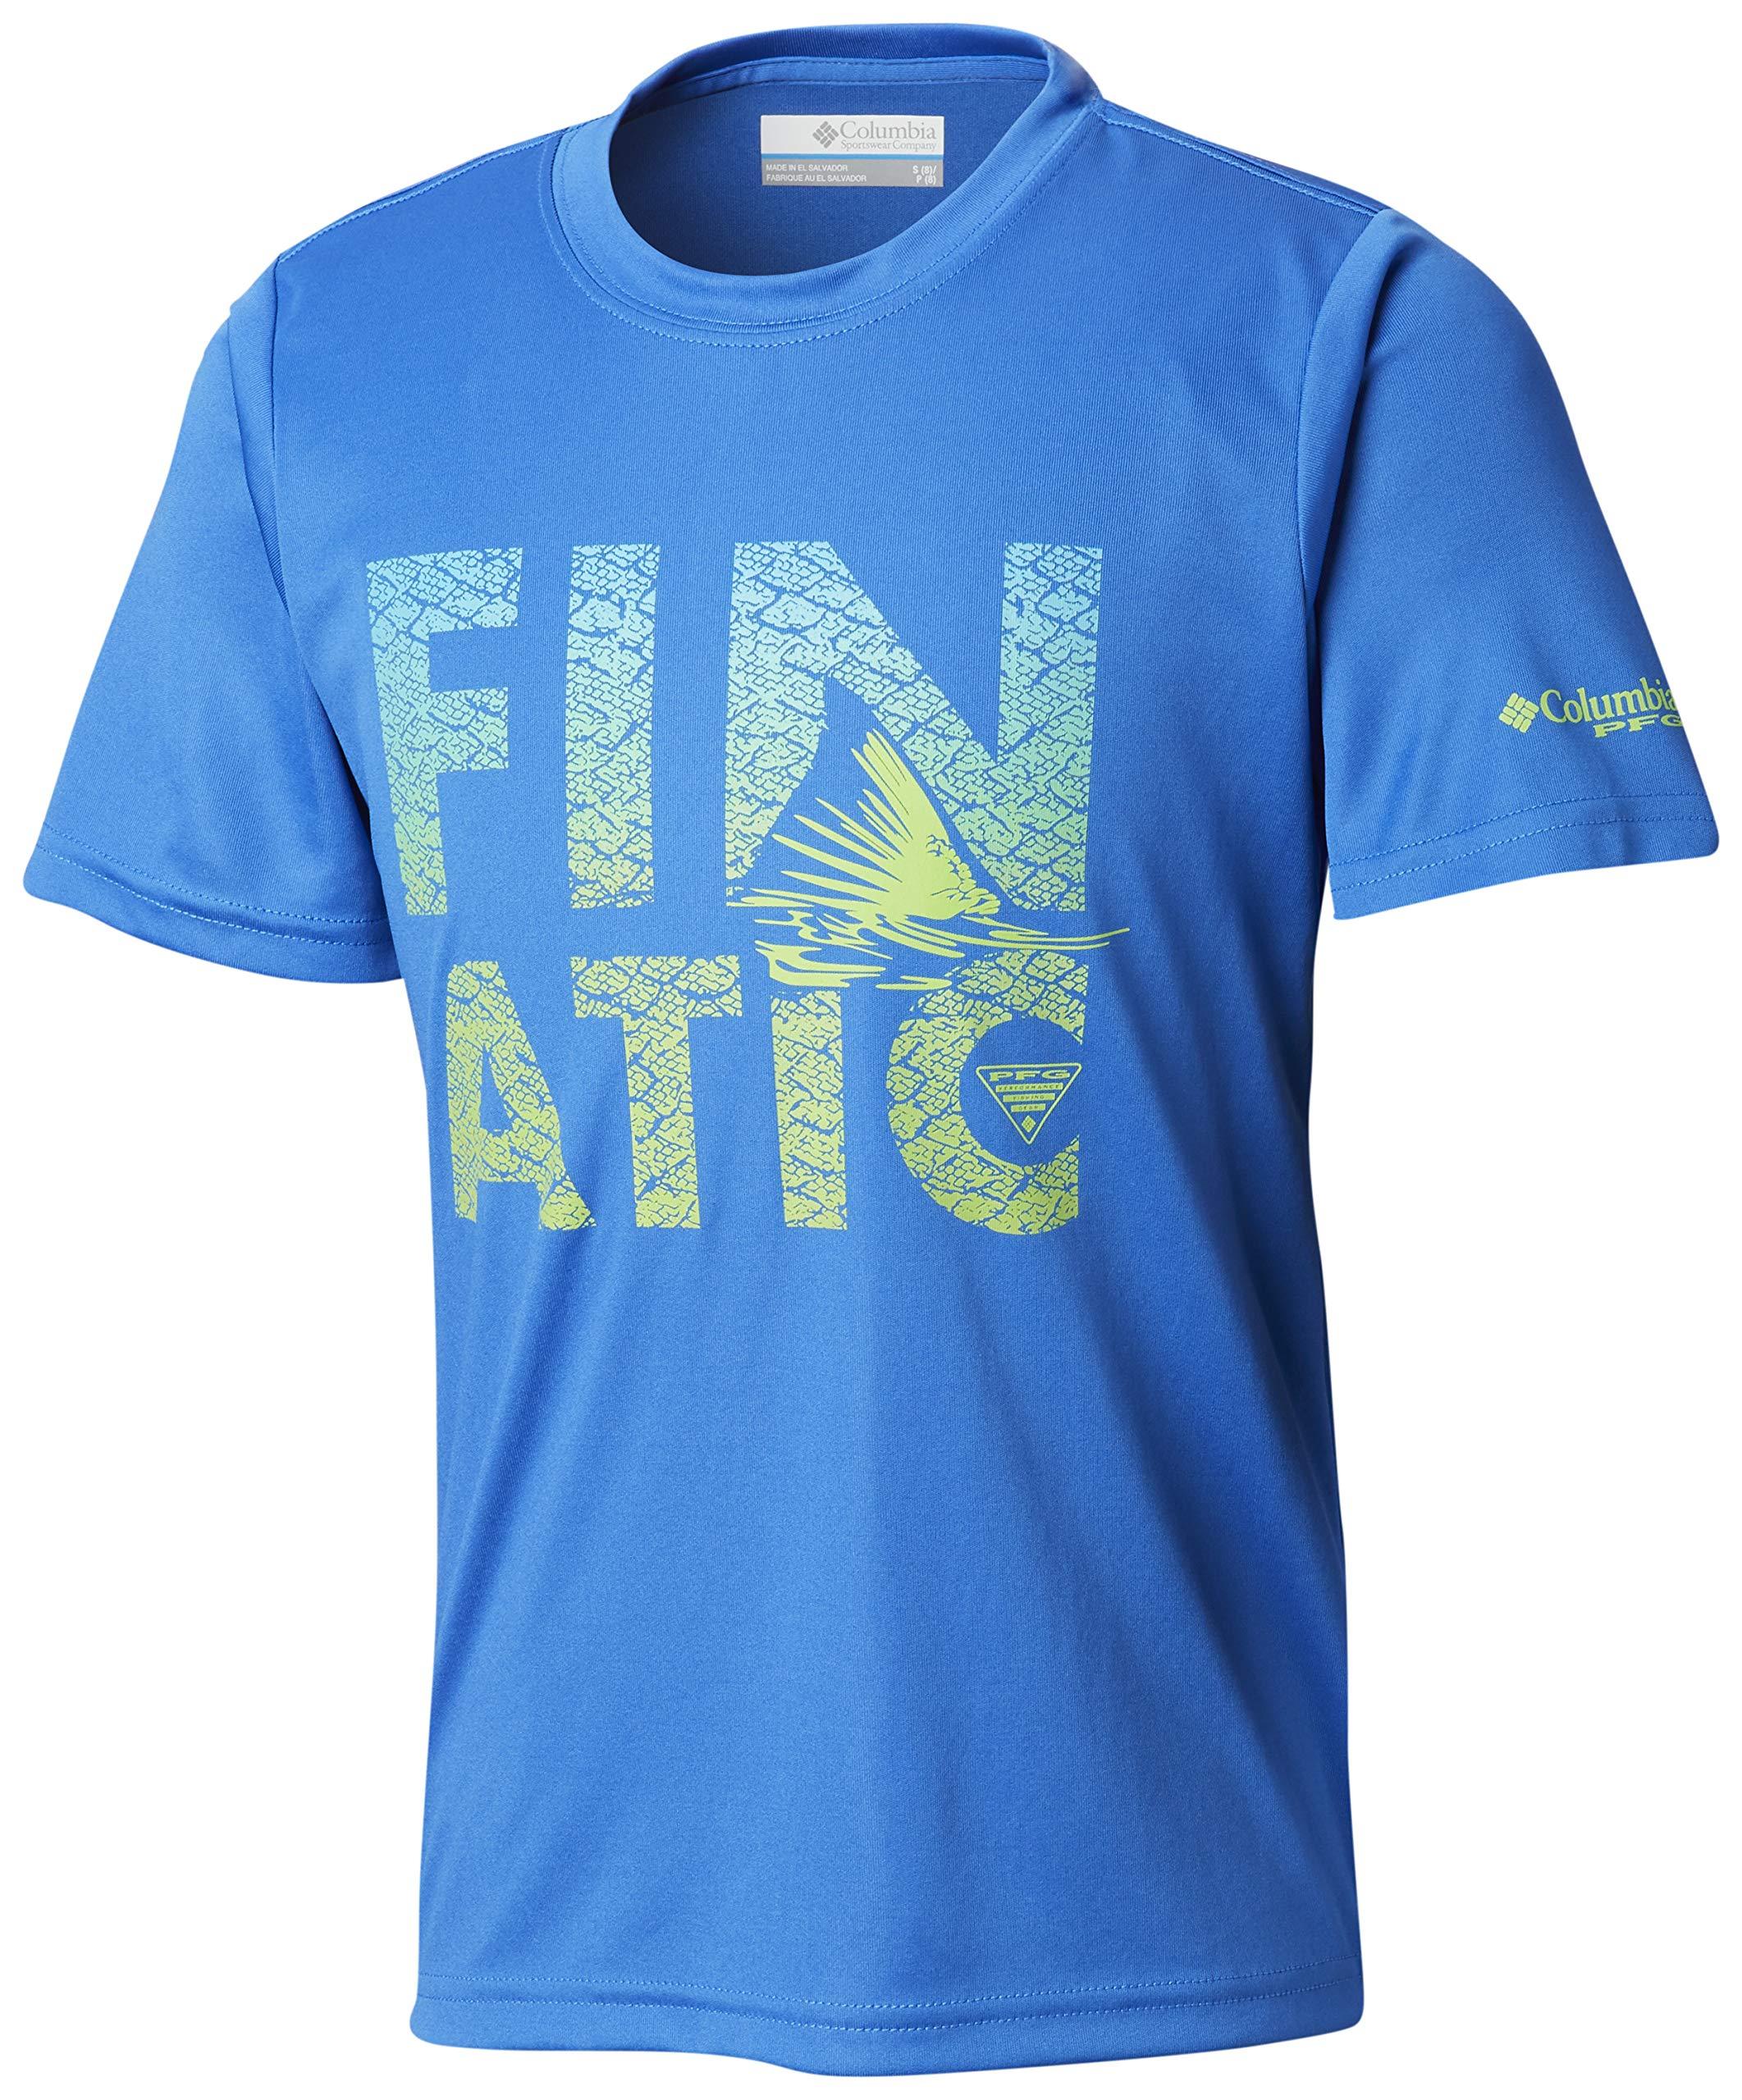 Columbia 1837201 Boys PFGFinatic Short Sleeve Shirt, Vivid Blue Finatic, X-Large